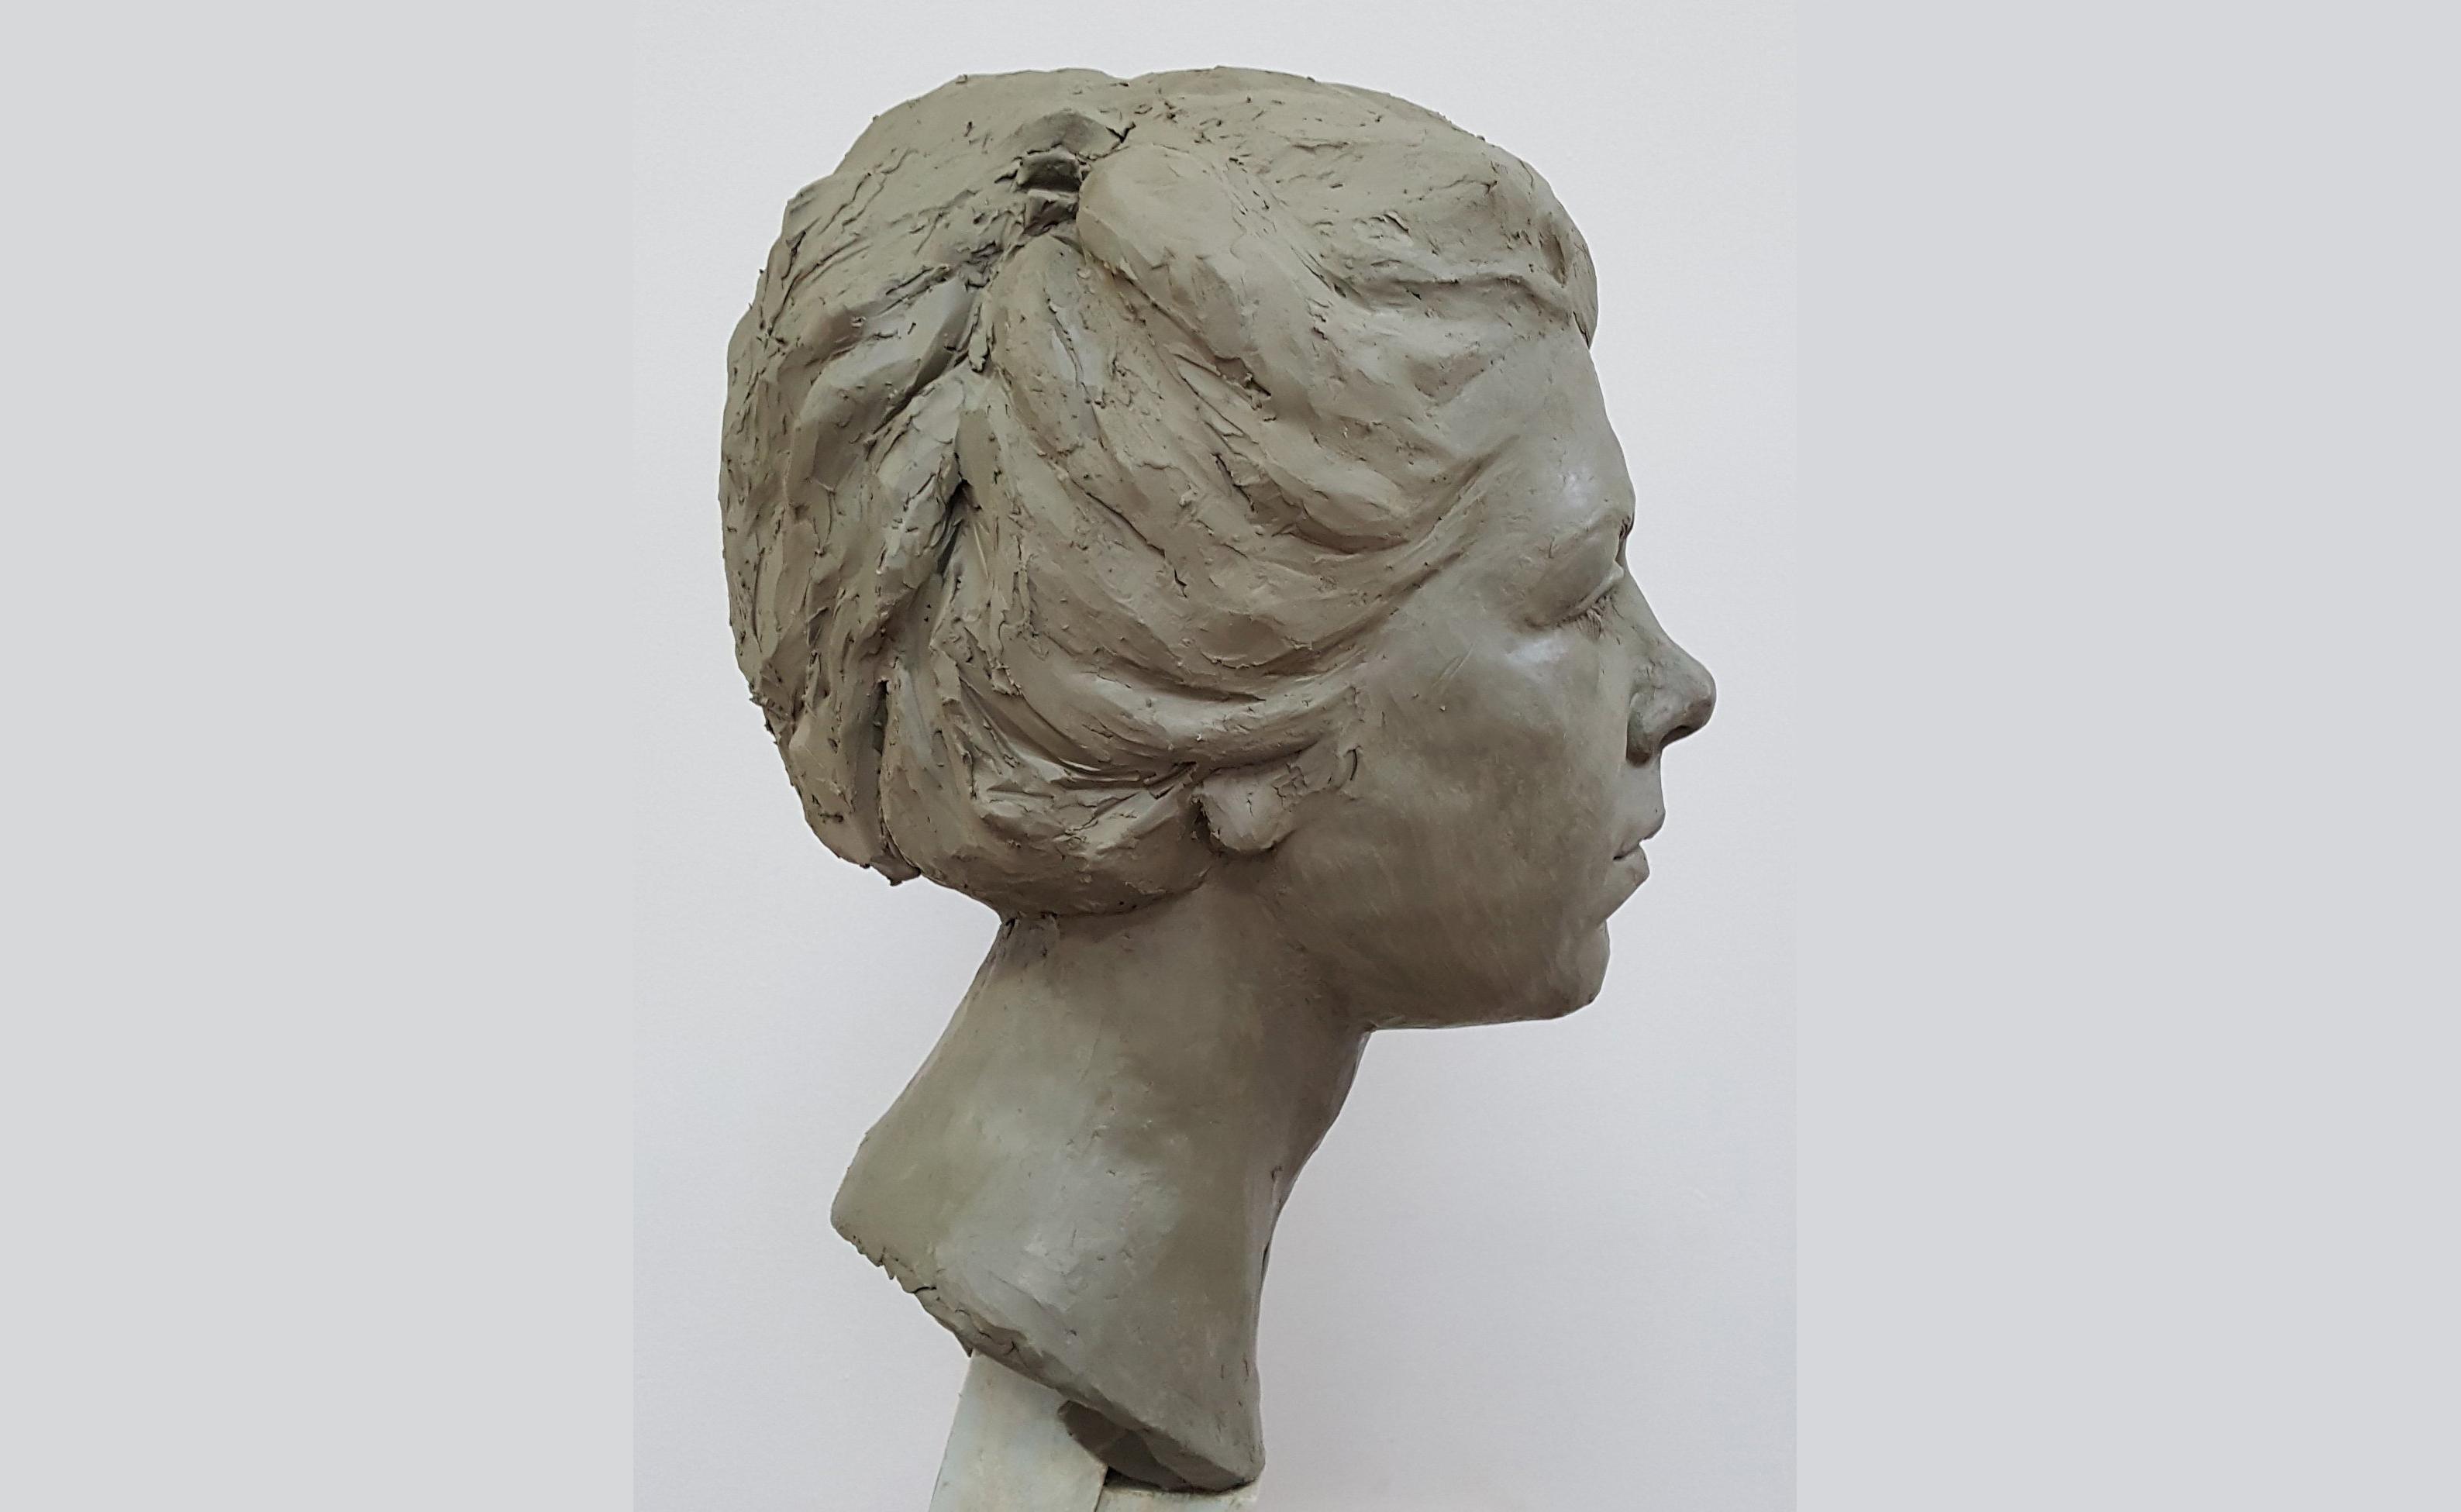 Portrait of Celeste side view